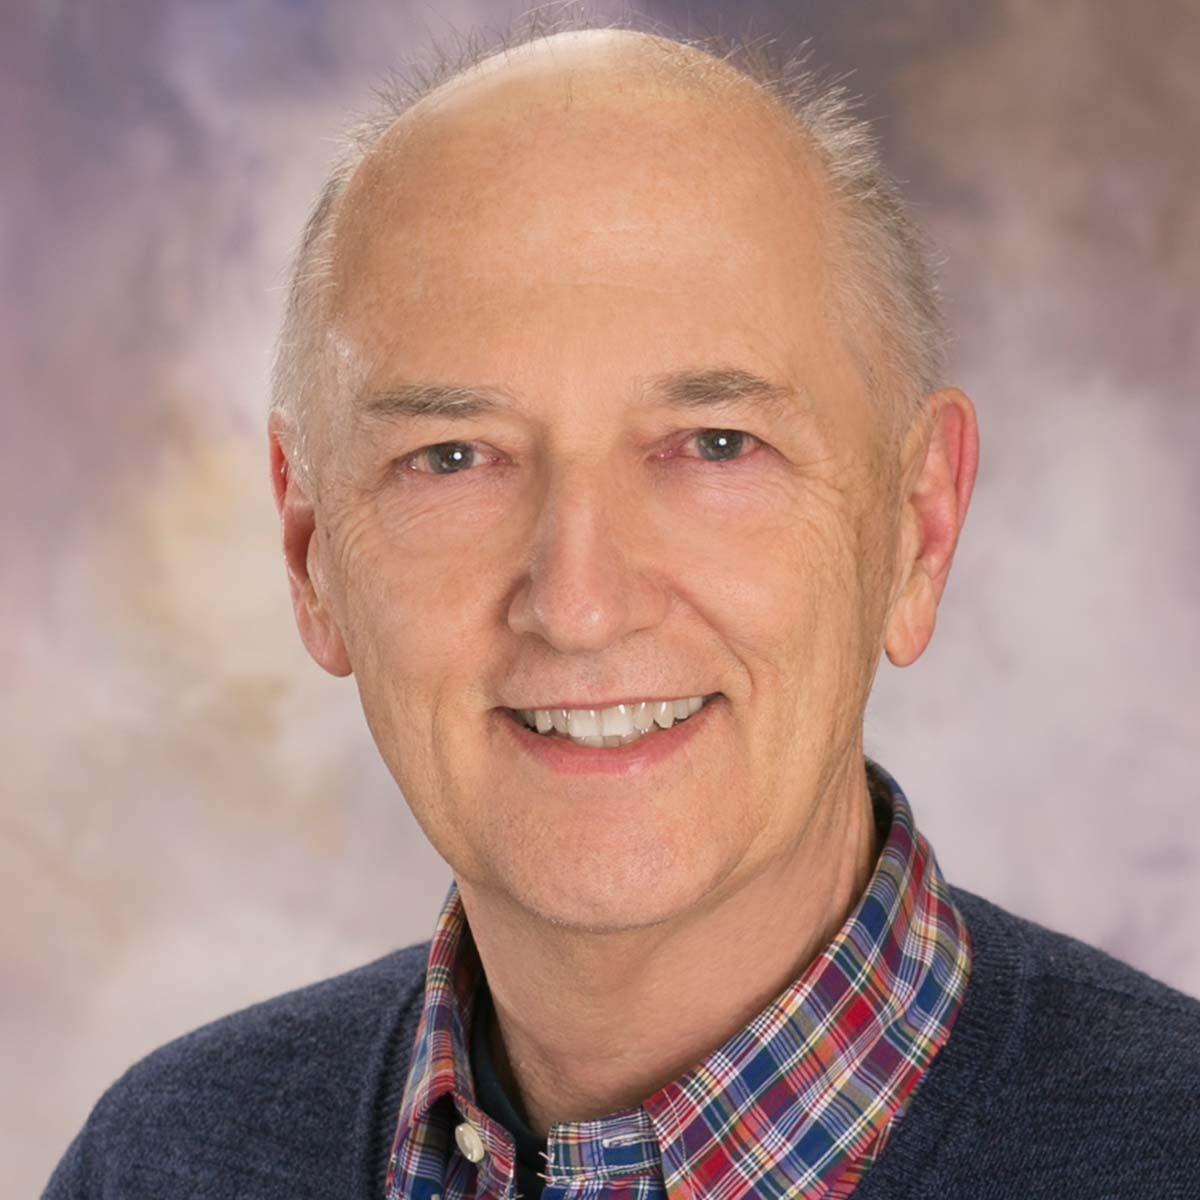 Larry Hofreiter